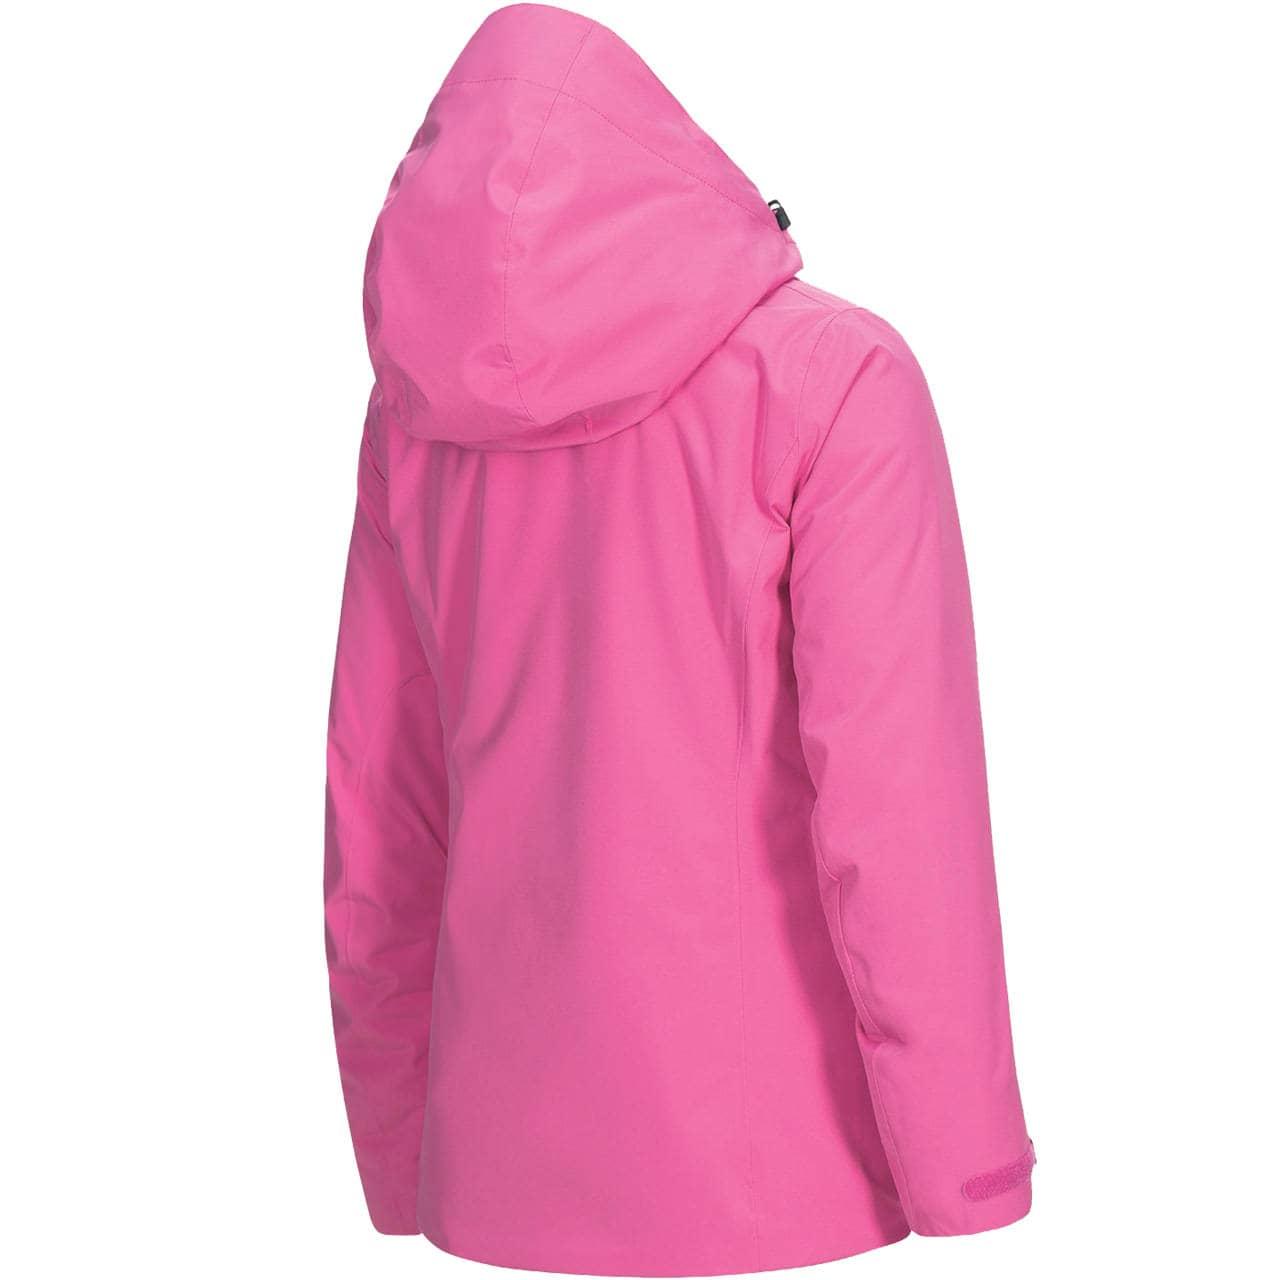 half off 9da4b 86756 Peak Performance Women Jacket Anima vibrant pink